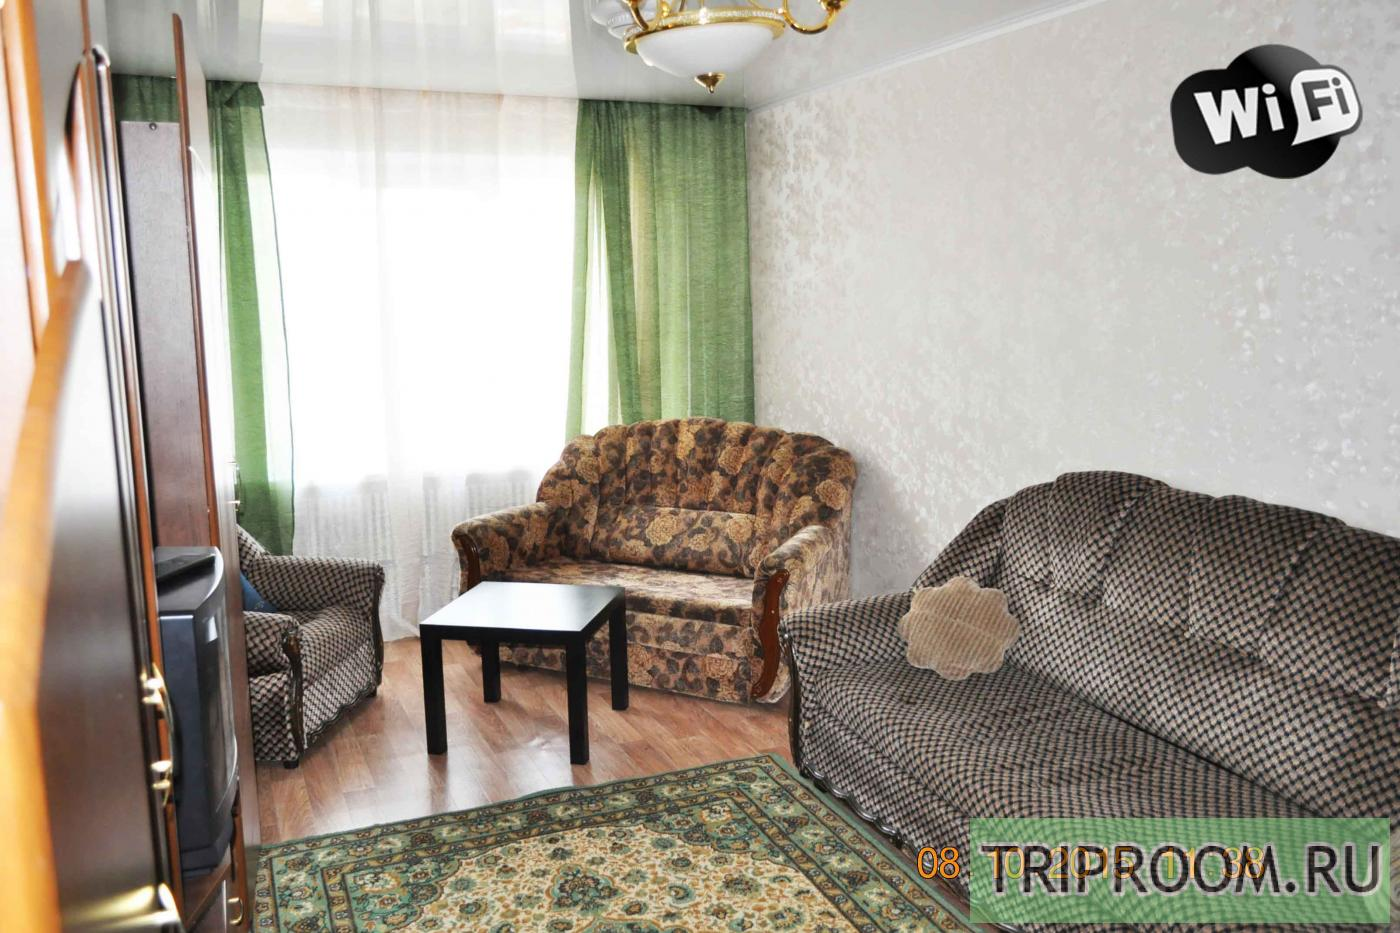 2-комнатная квартира посуточно (вариант № 11708), ул. Амосова улица, фото № 19